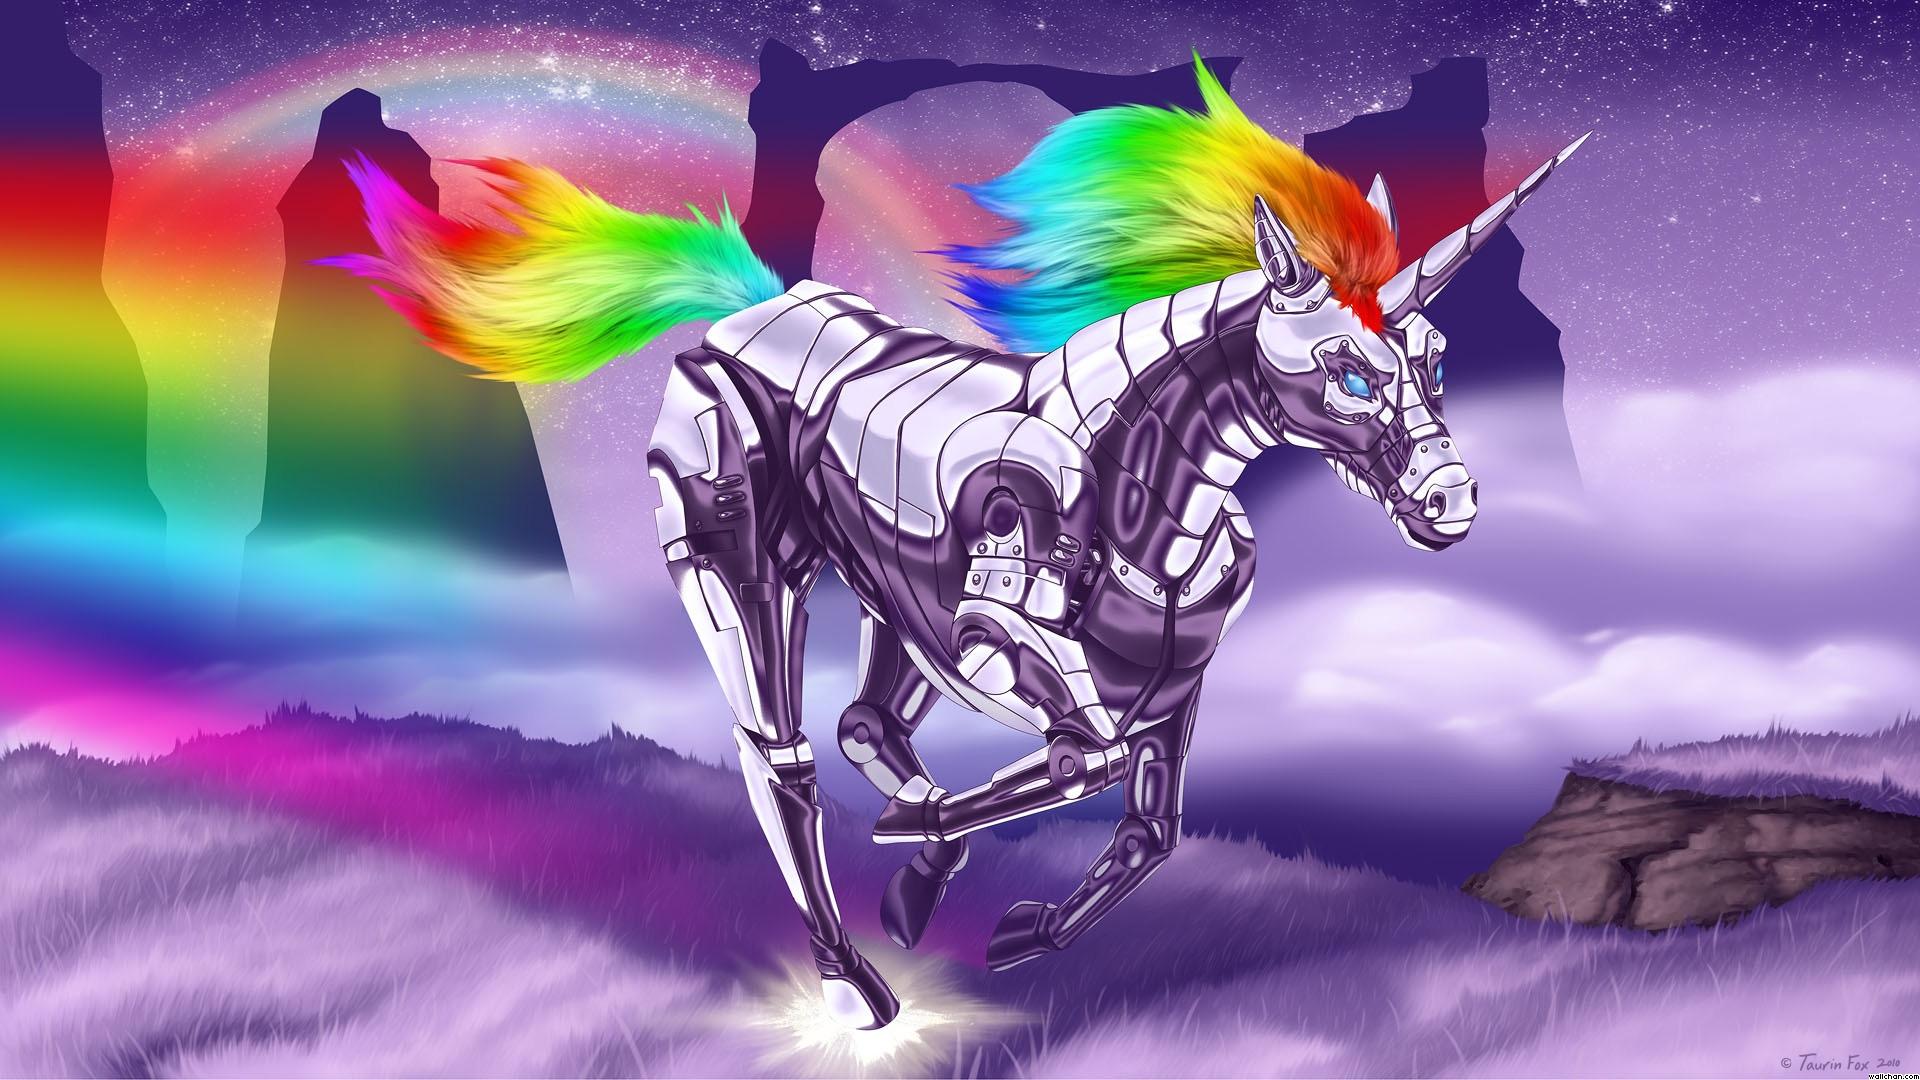 45+] Robot Unicorn Attack Wallpaper on ...